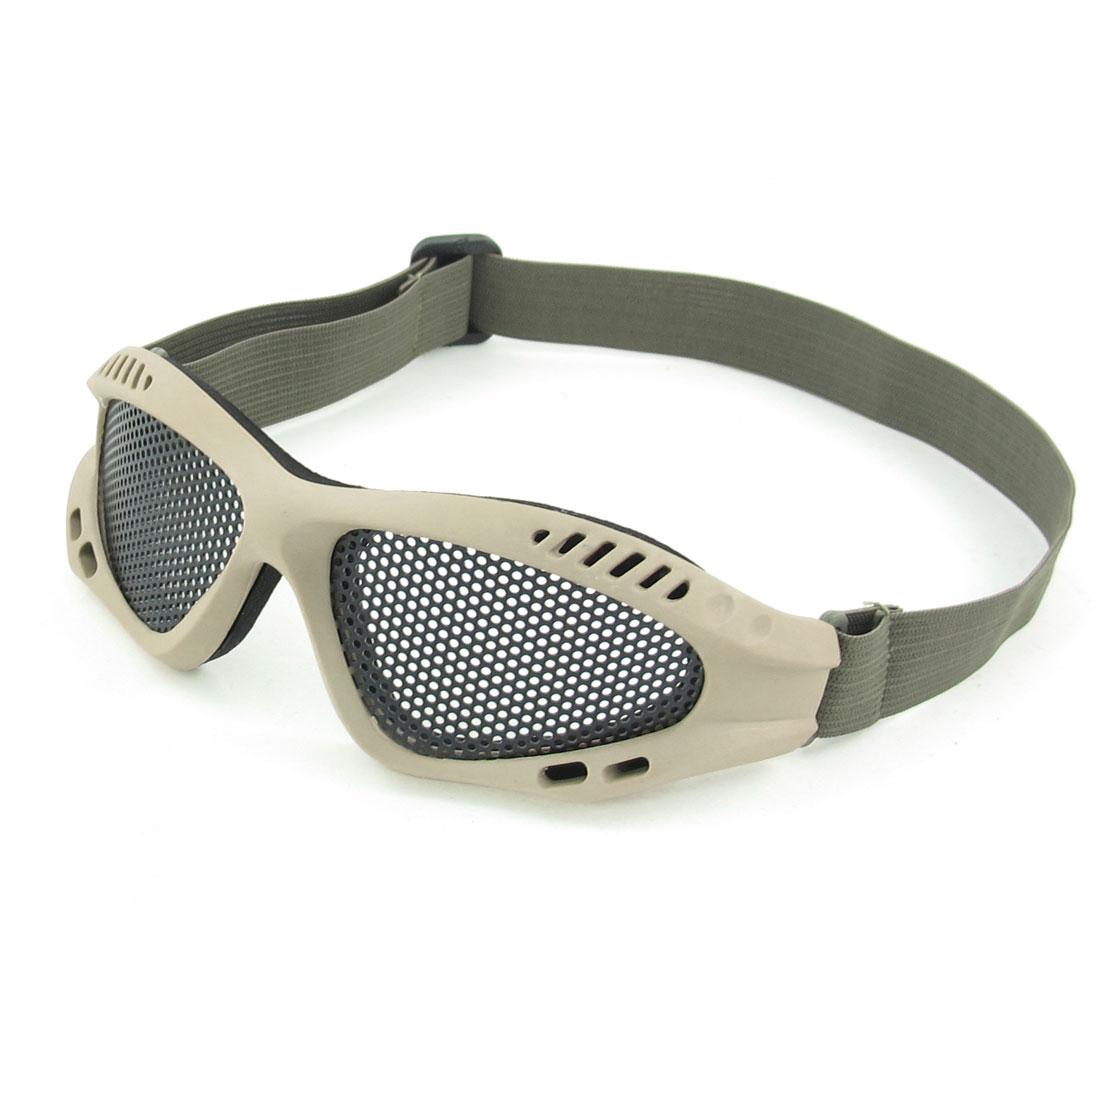 Unisex Black Triangular Net Shape Lens Adjustable Band Mesh Goggles